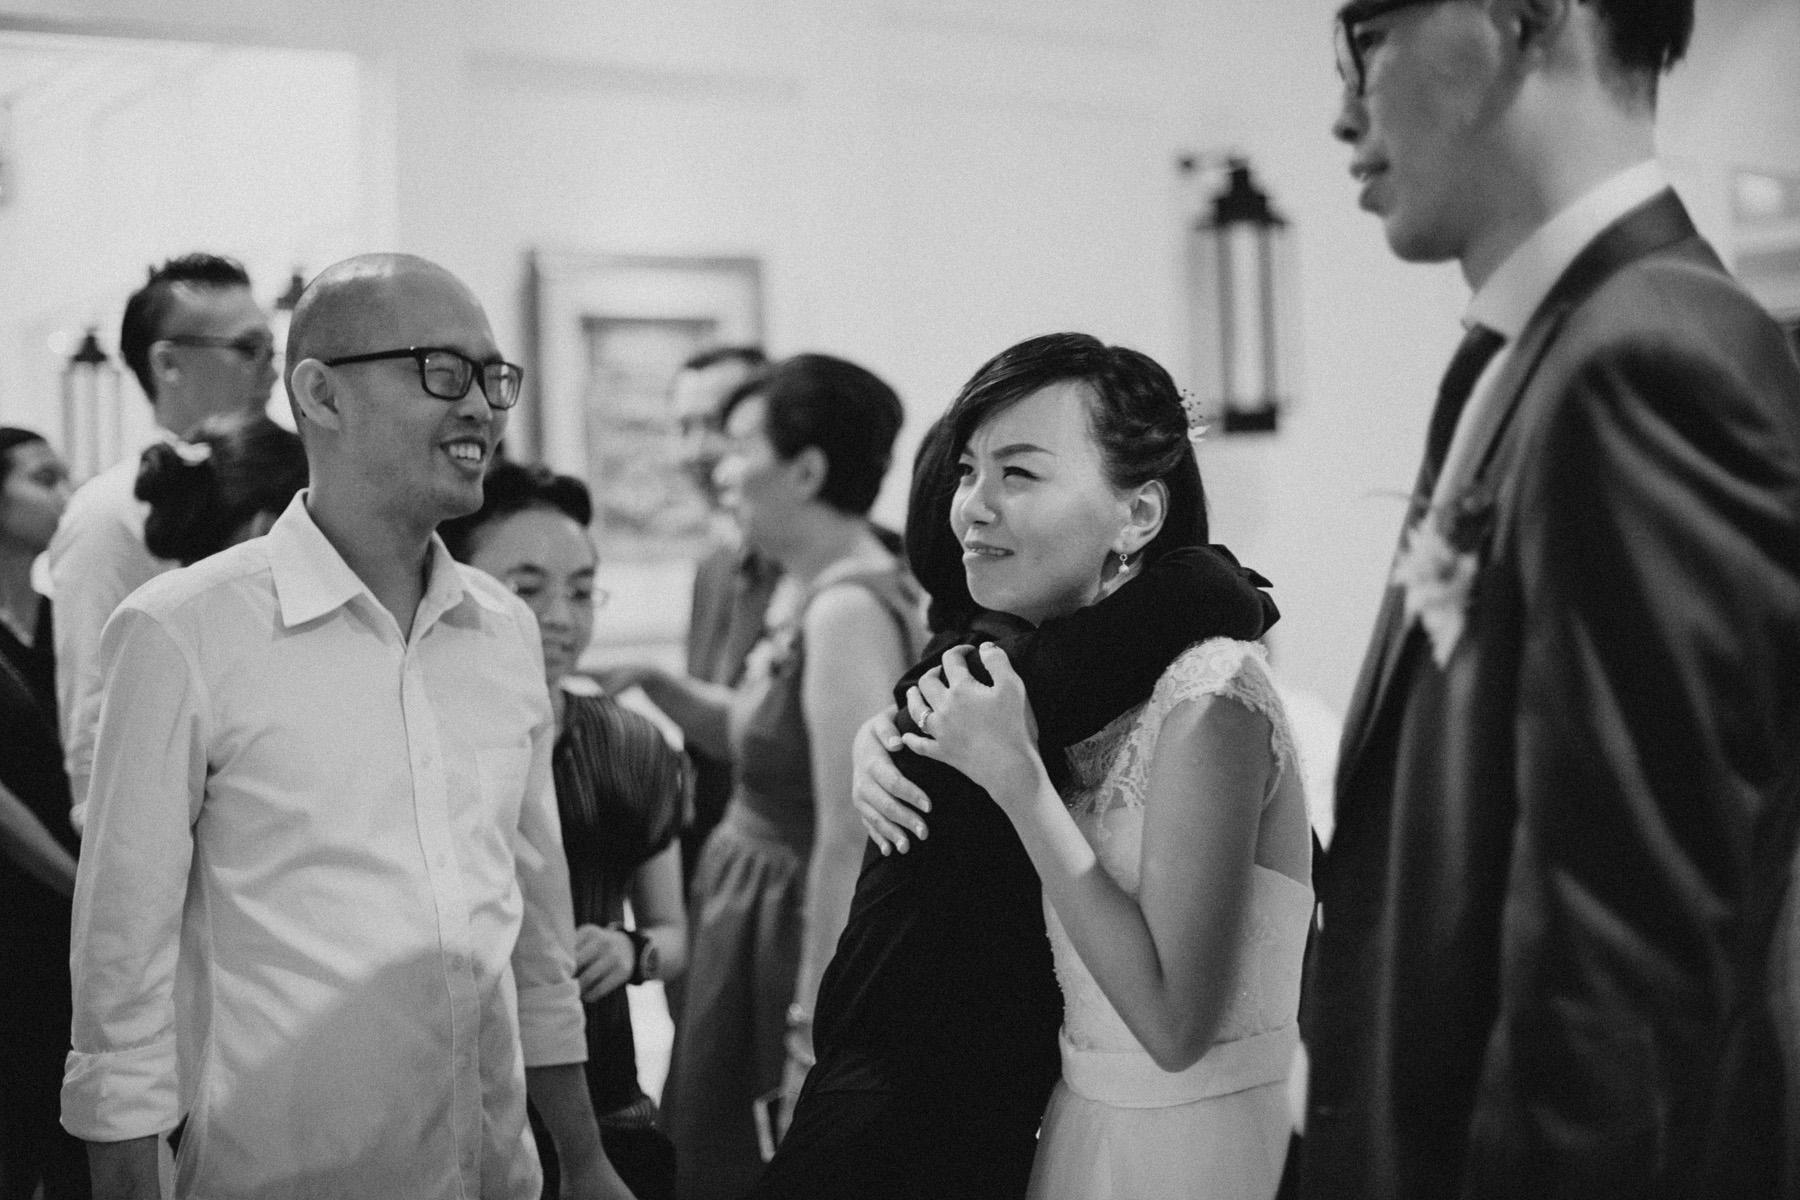 singapore-wedding-travel-photographer-faith-alvin-wedding-wmt-58.jpg